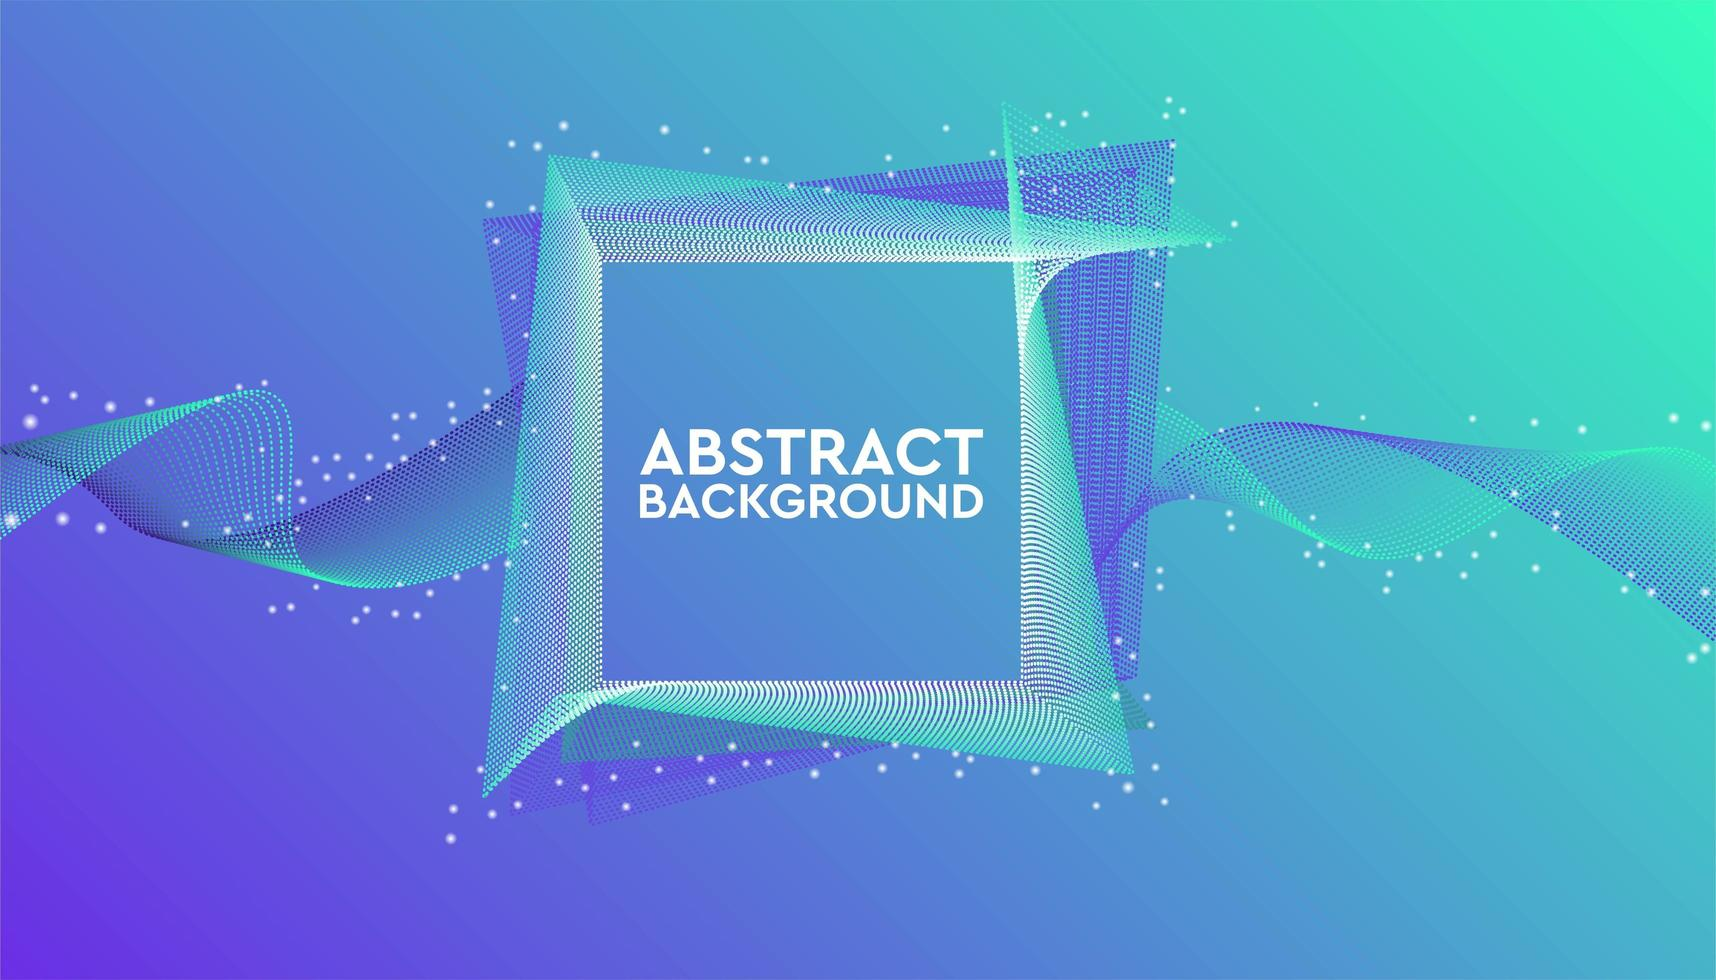 blå och grön geometrisk banner vektor